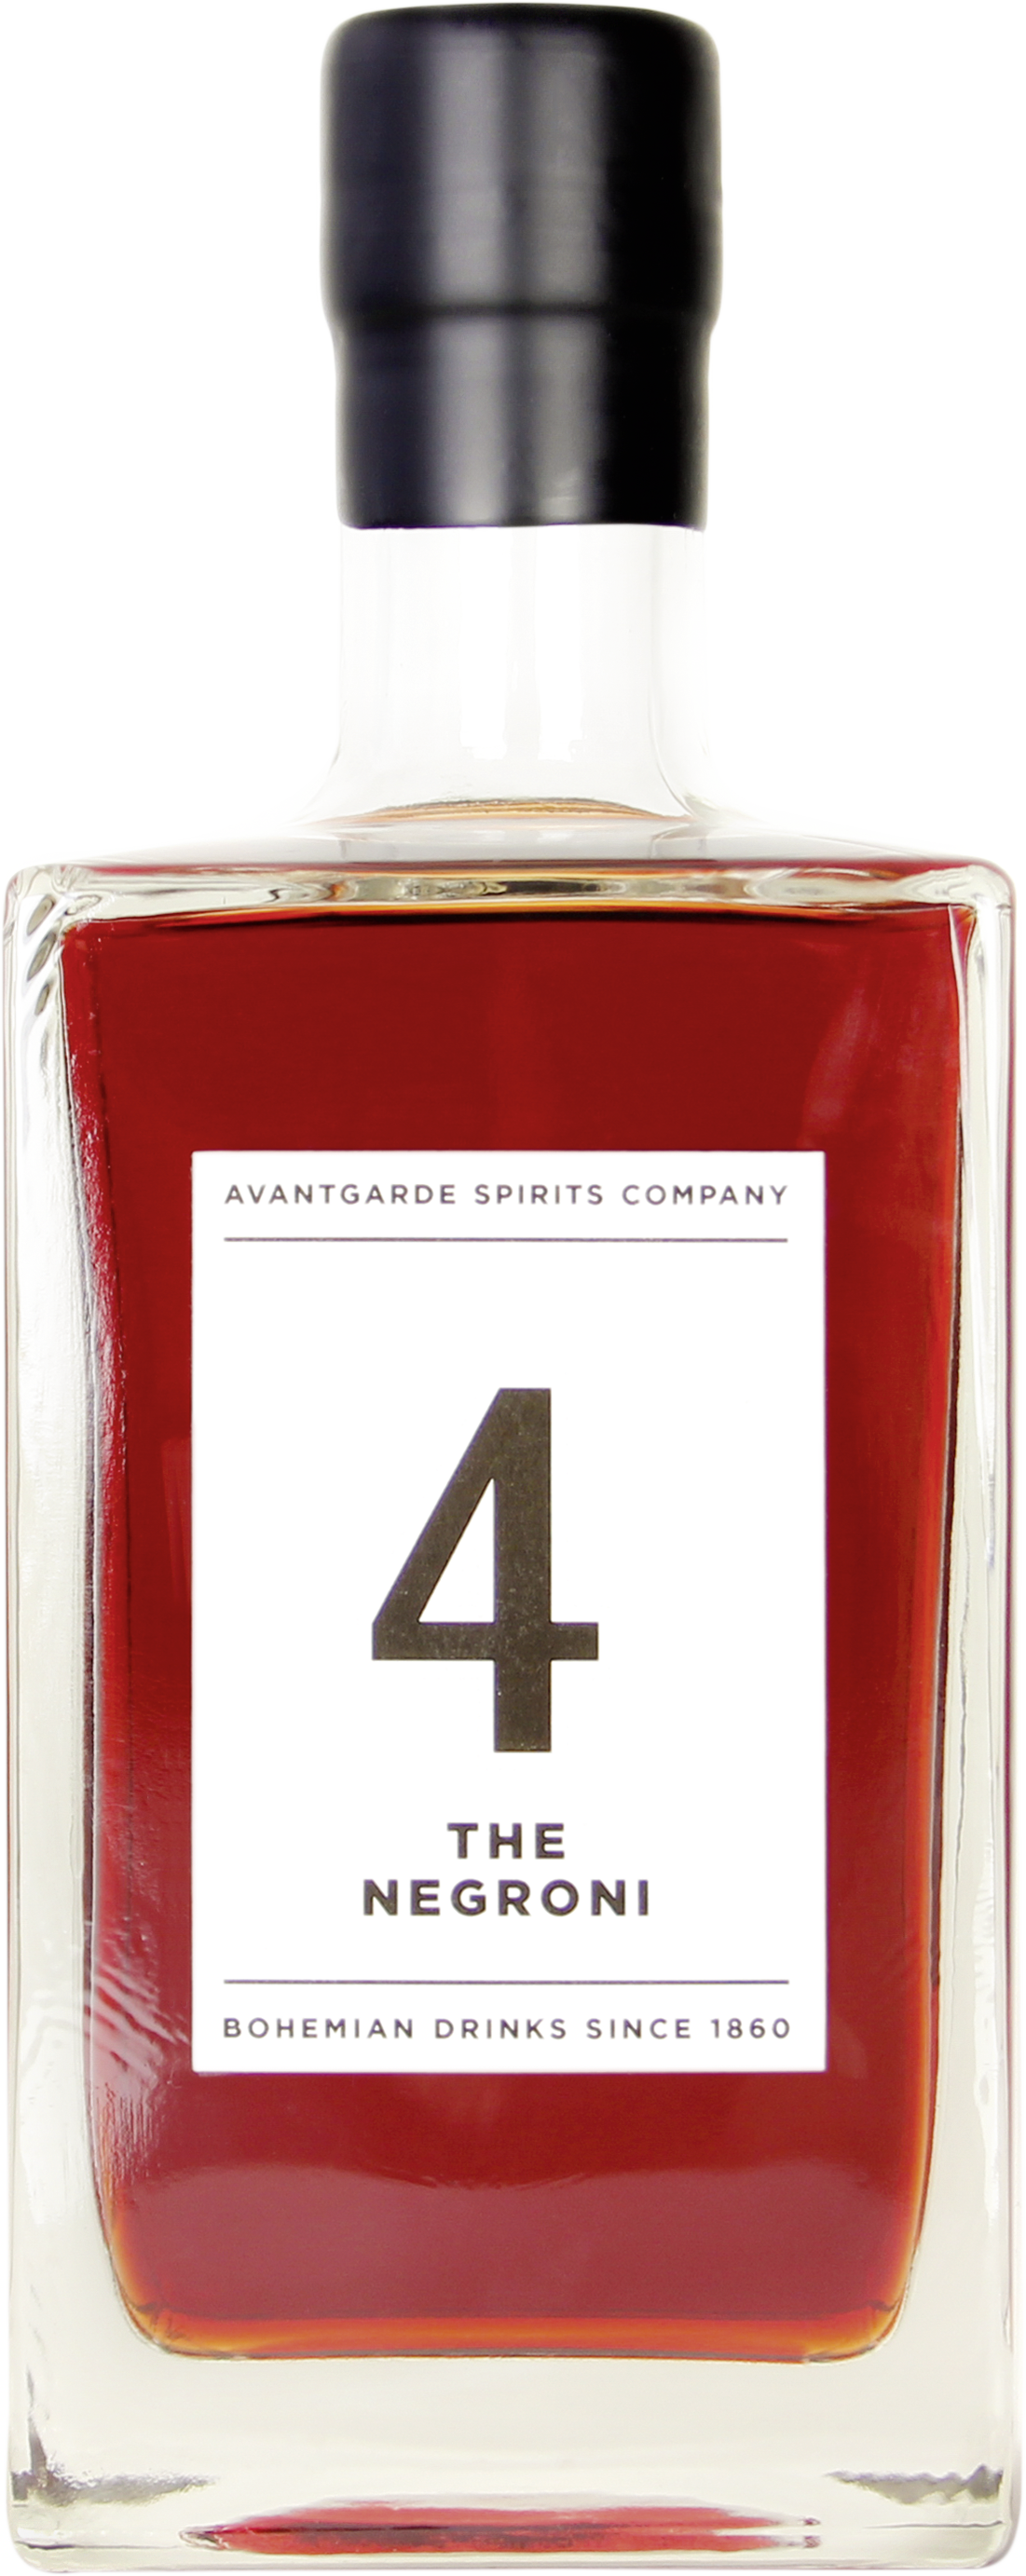 AVANTGARDE SPIRITS COMPANY - 4 The Negroni